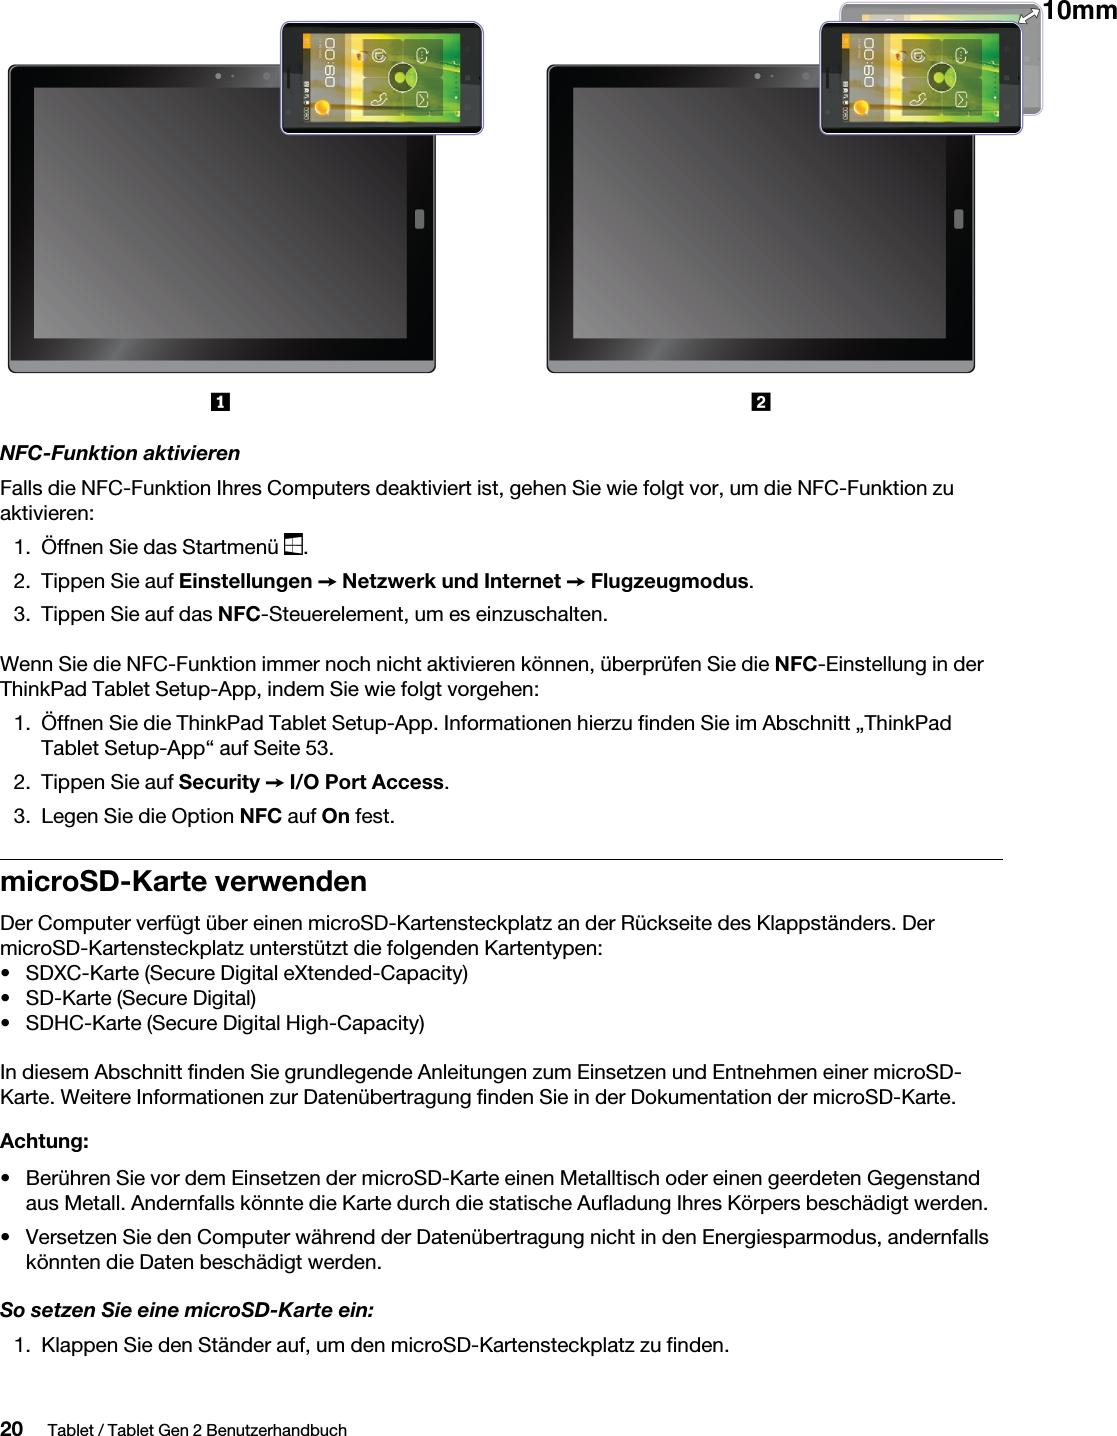 Sdxc Kartensteckplatz.Lenovo X1 Tablet Gen 2 Ug De Benutzerhandbuch User Manual